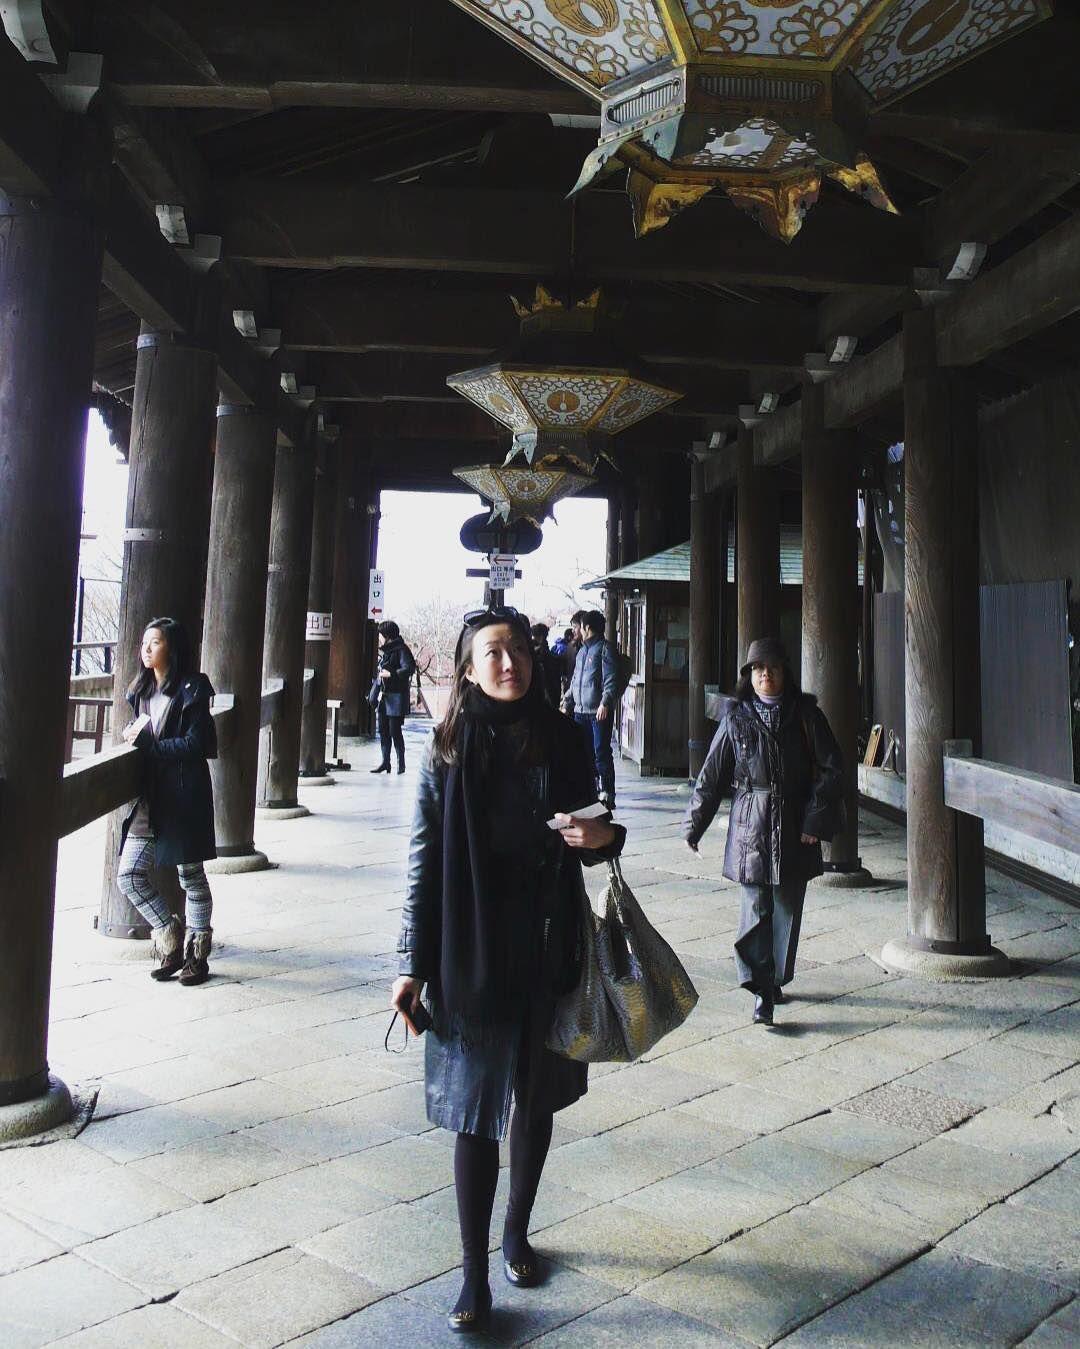 "17 Likes, 6 Comments - Eunice Choi (@culinaryartisans) on Instagram: ""가고싶다가고싶다😭 . #오사카 #가족여행절실 #실은혼자떠나고싶.."""